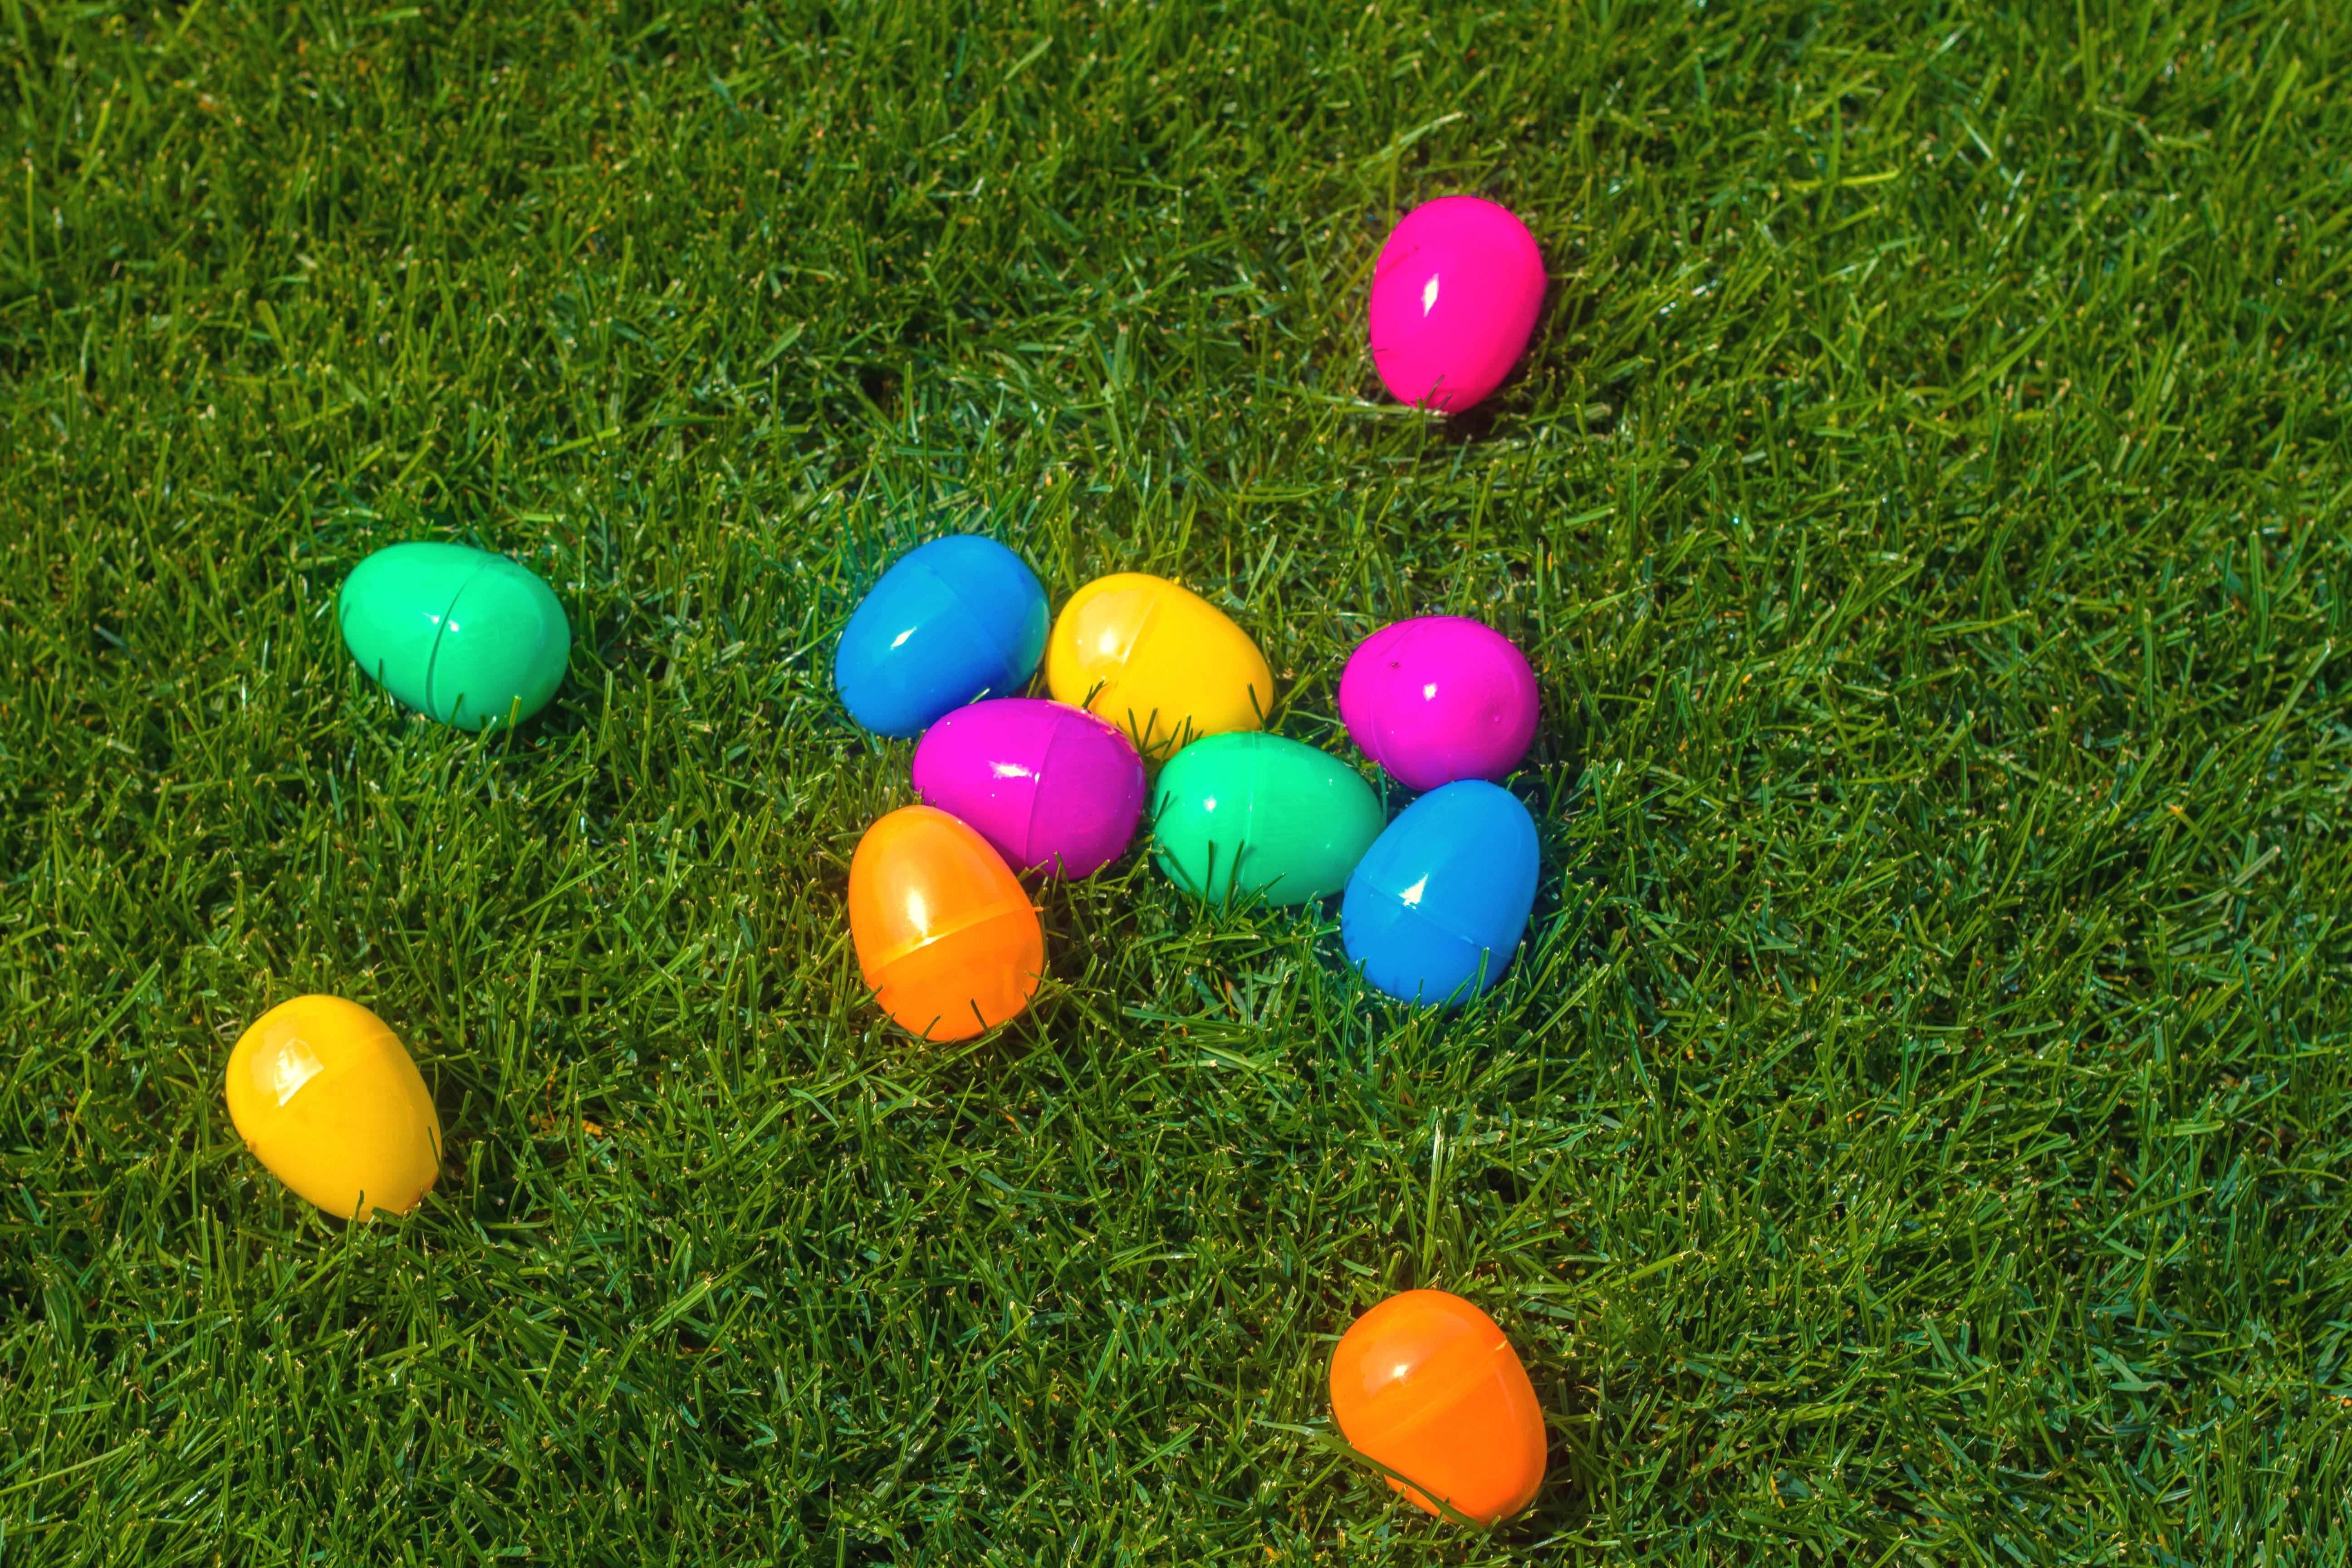 Everyone loves an egg hunt!